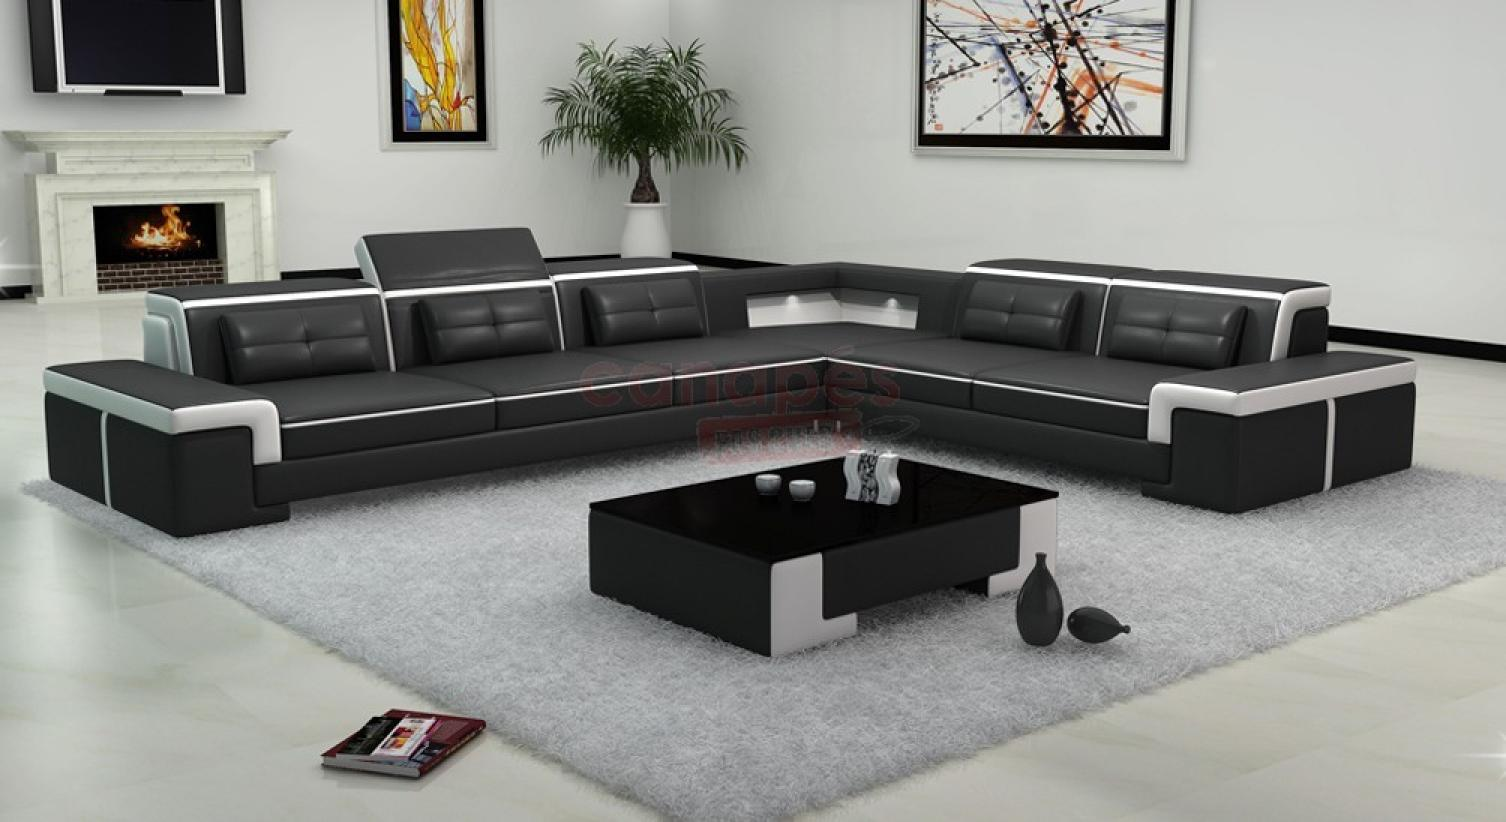 Photos canap design pas cher noir et blanc for Grand canape angle pas cher